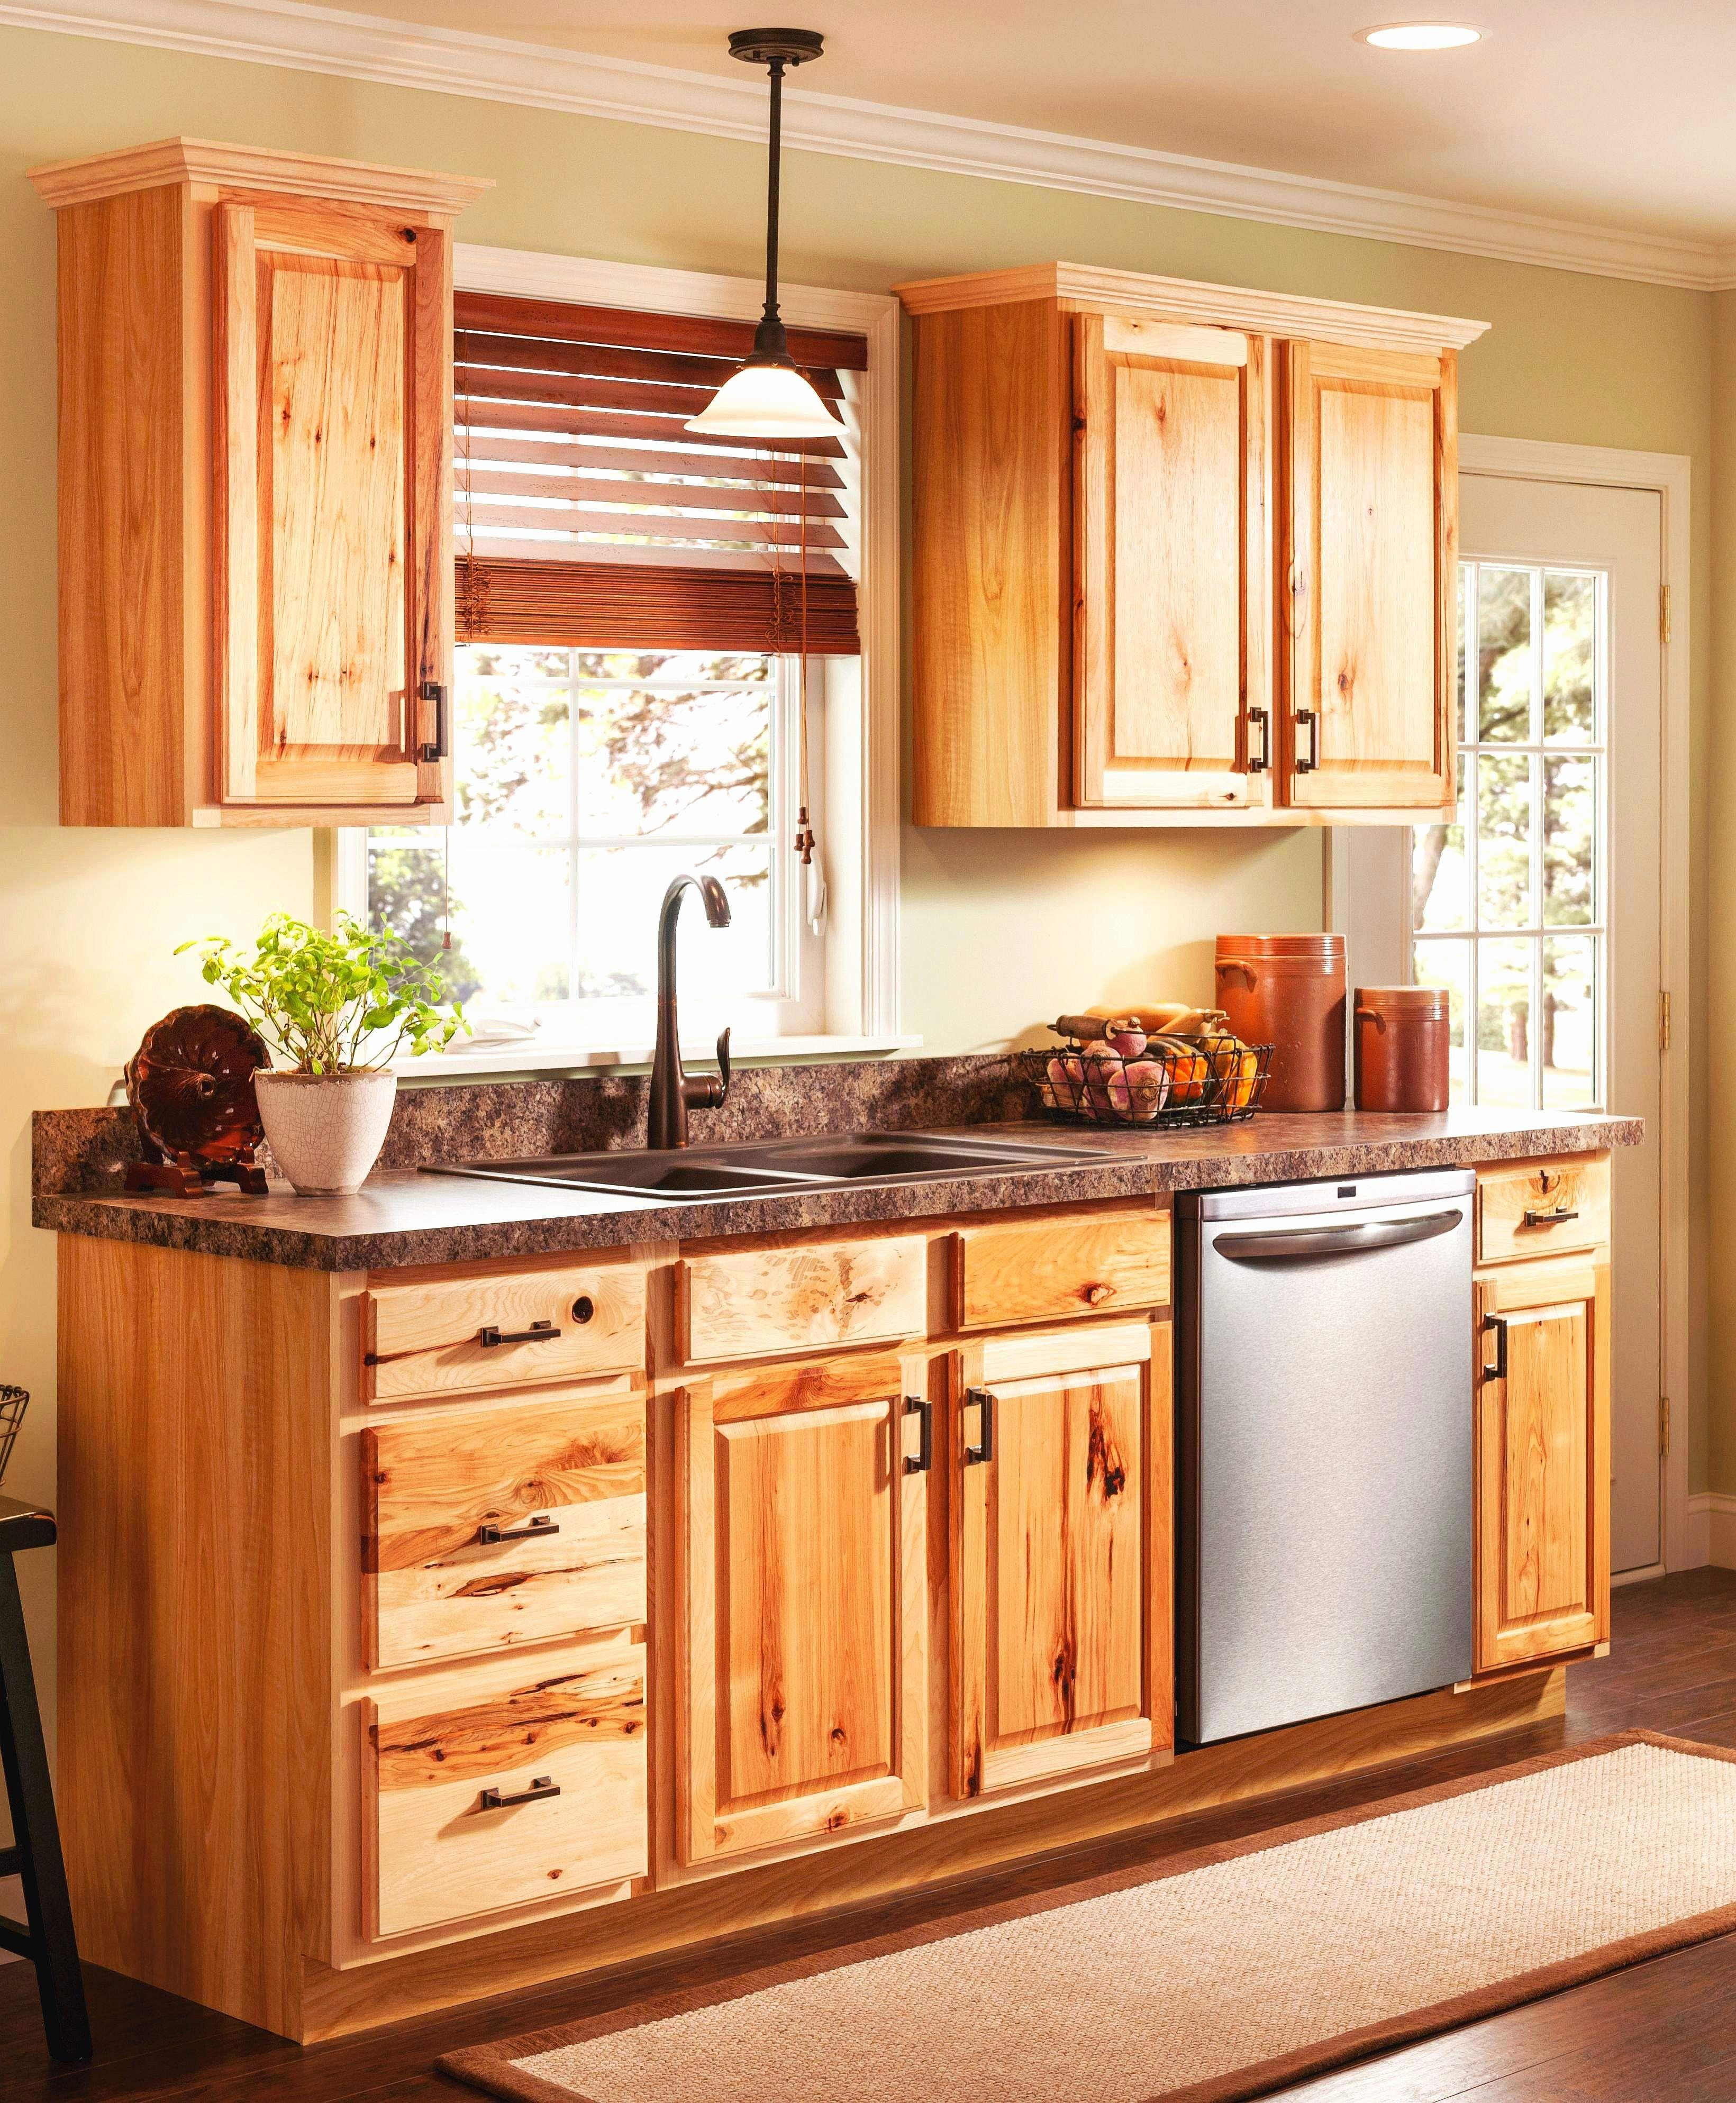 Kitchen Kompact Certified Kcma Cabinets Hickory Kitchen Cabinets Kitchen Cabinet Design New Kitchen Cabinets